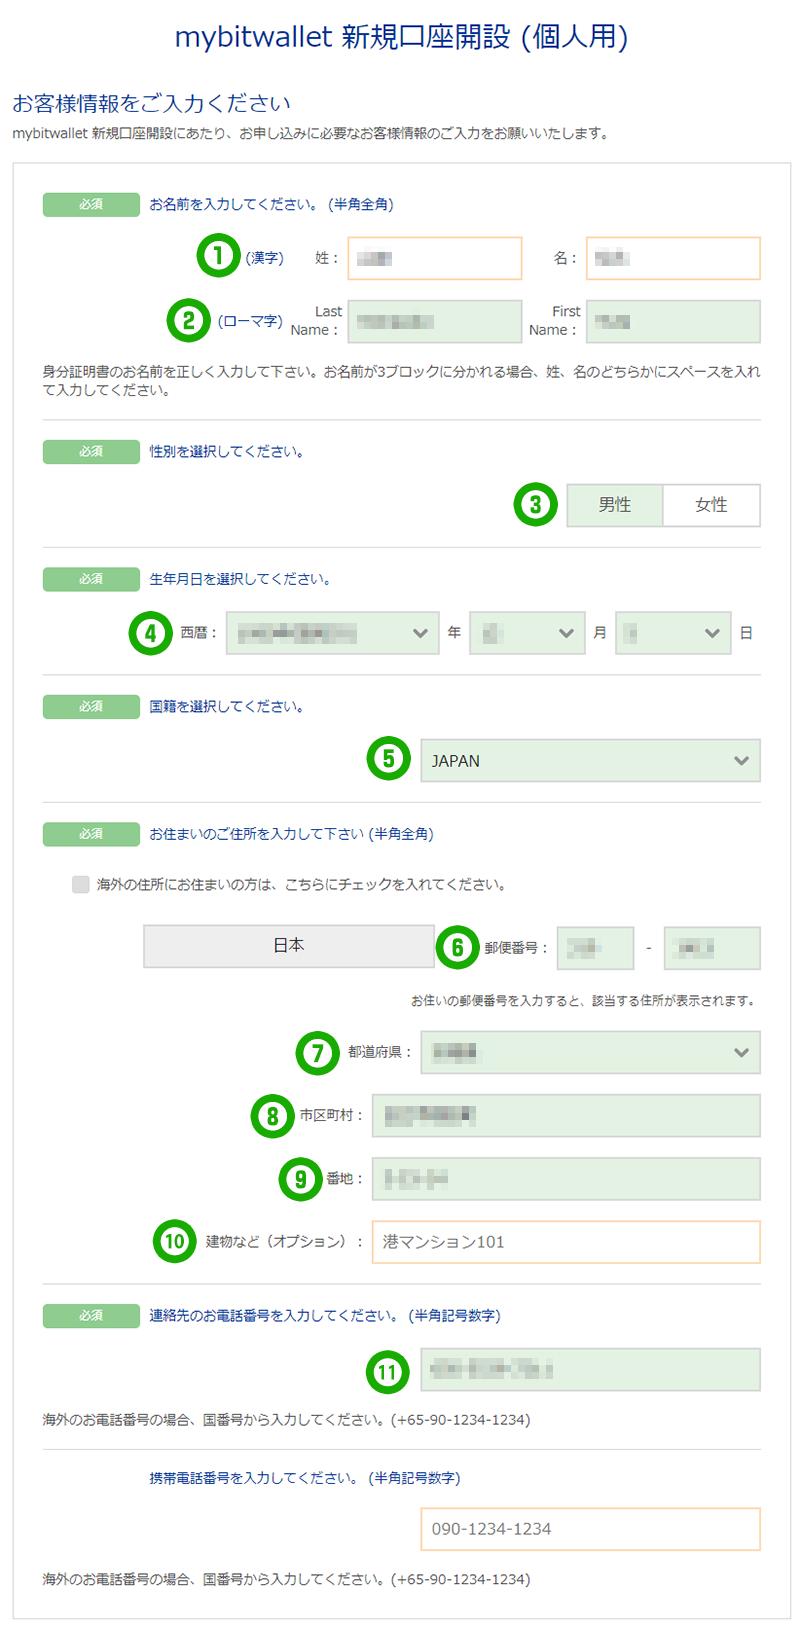 bitwallet登録方法